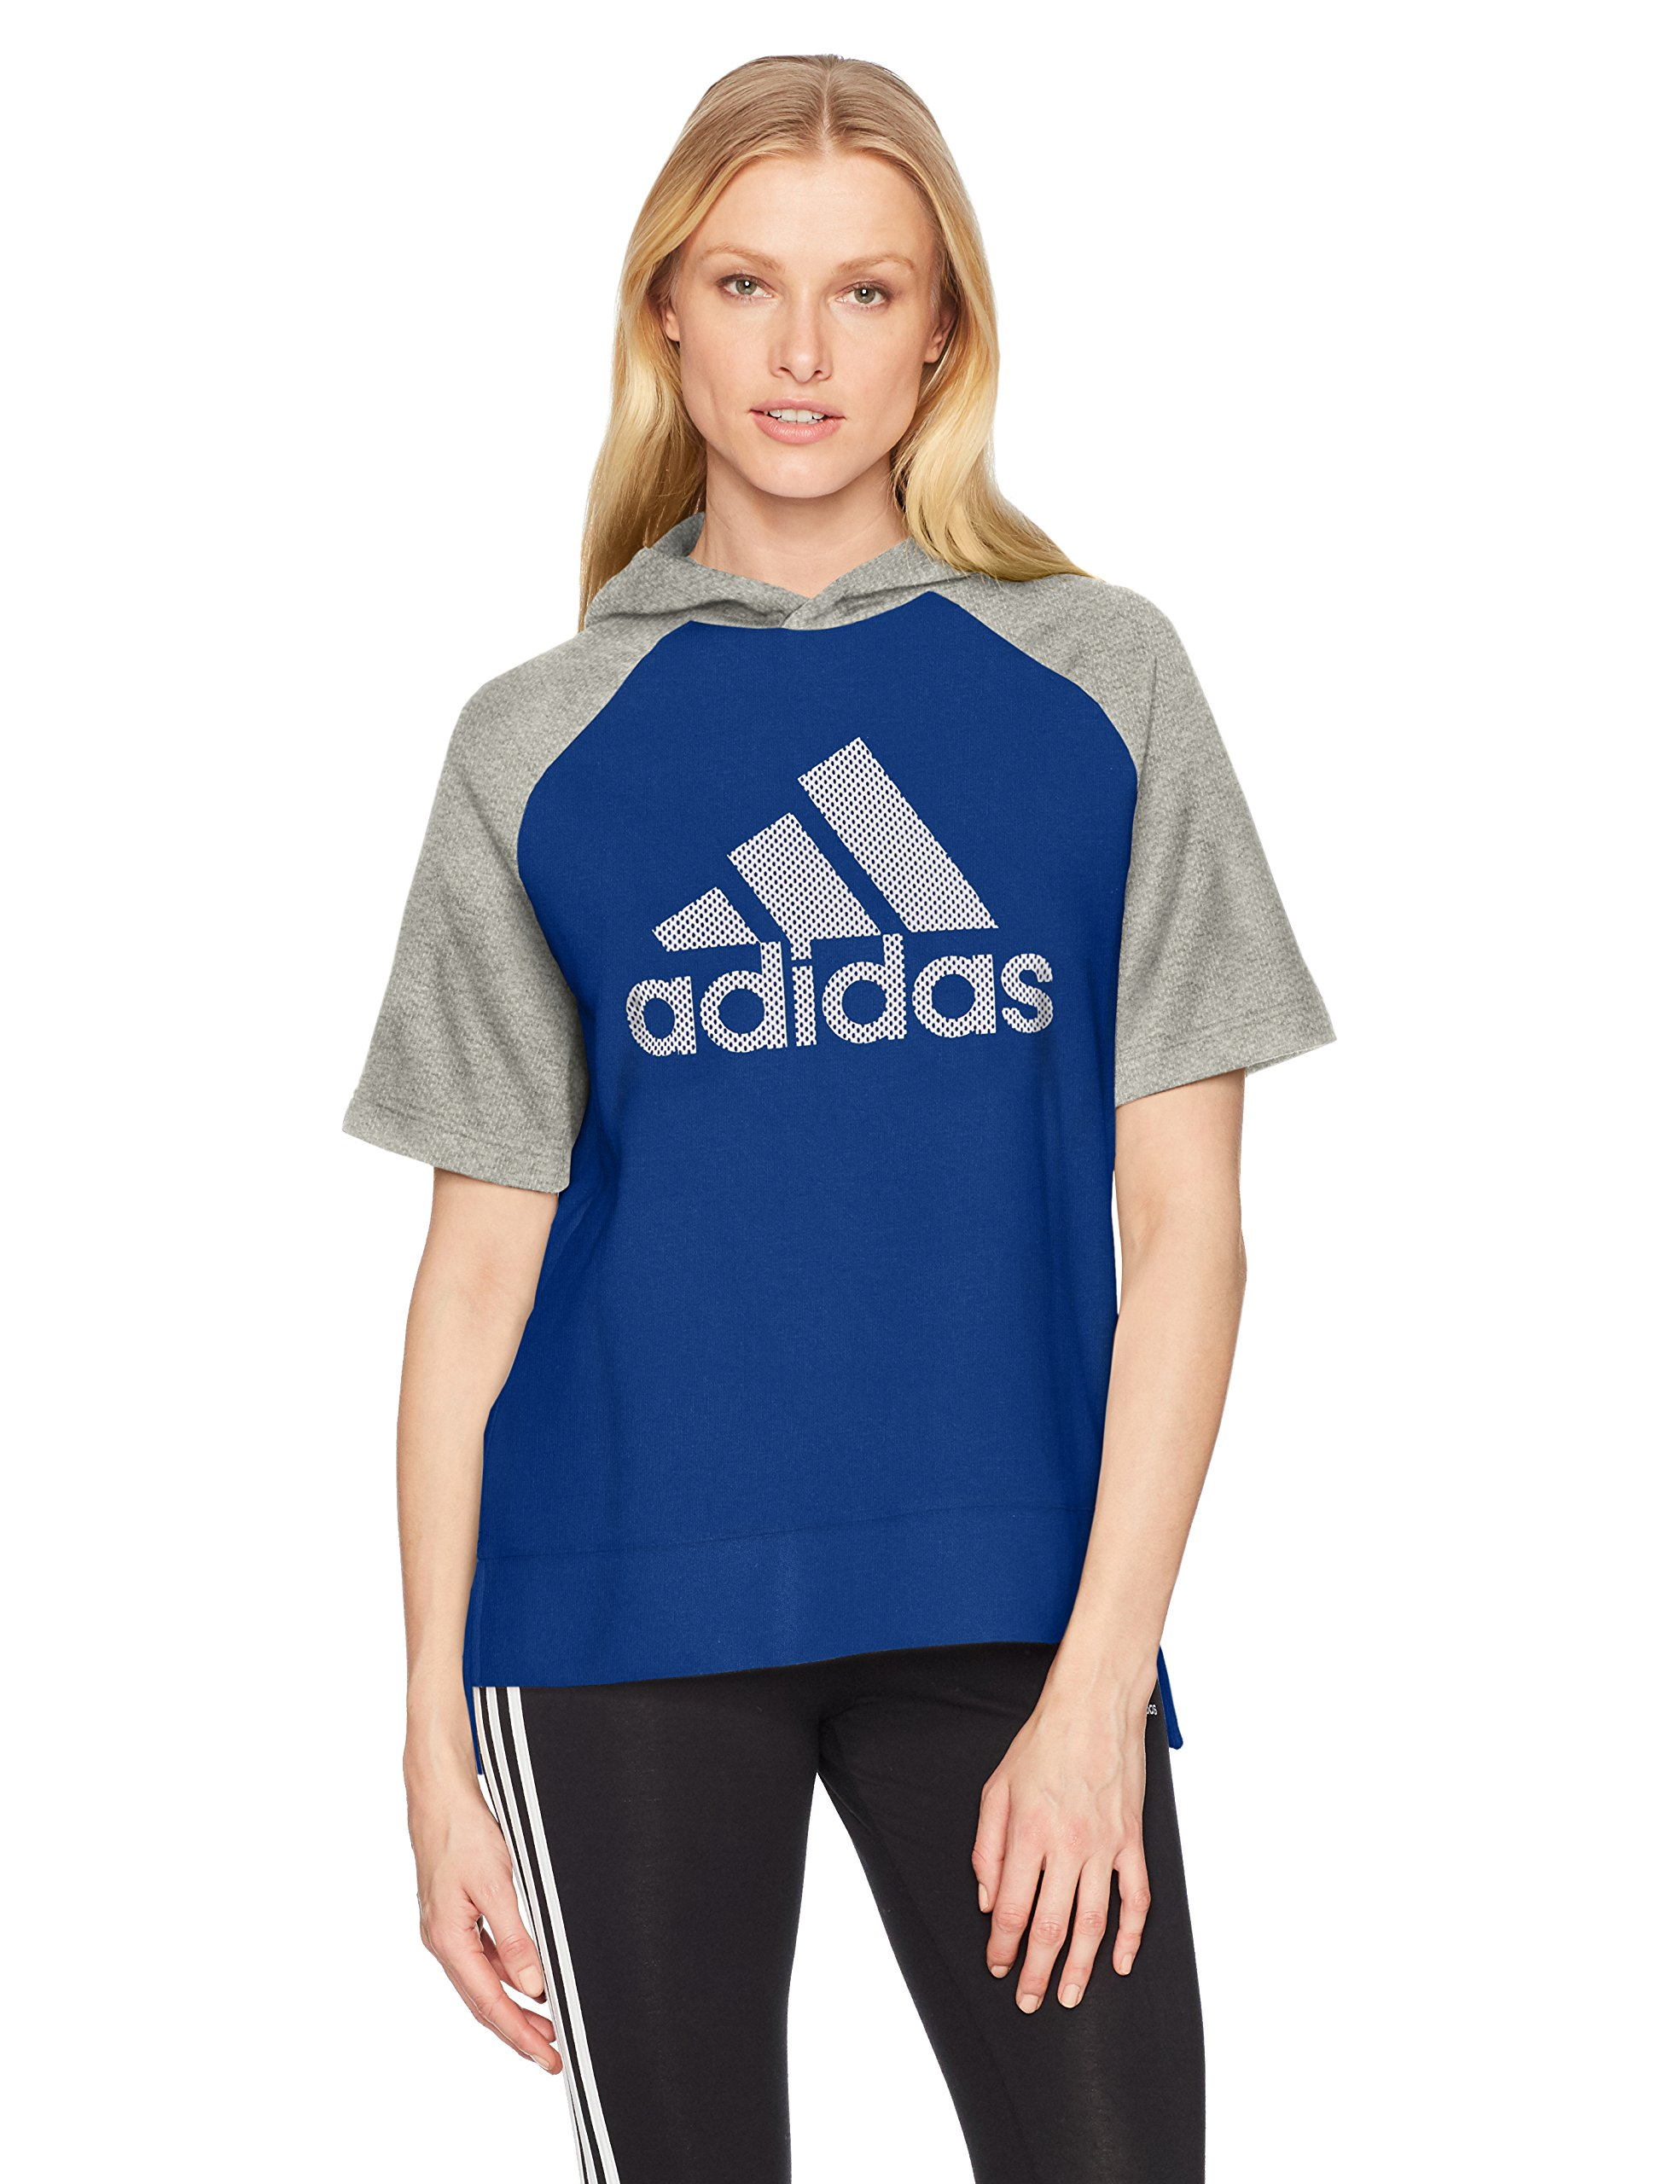 adidas Womens Athletics Fashion Full Zip Short sleeve Hoody, Mystery Ink/Medium Grey Heather/Noble Ink, Large